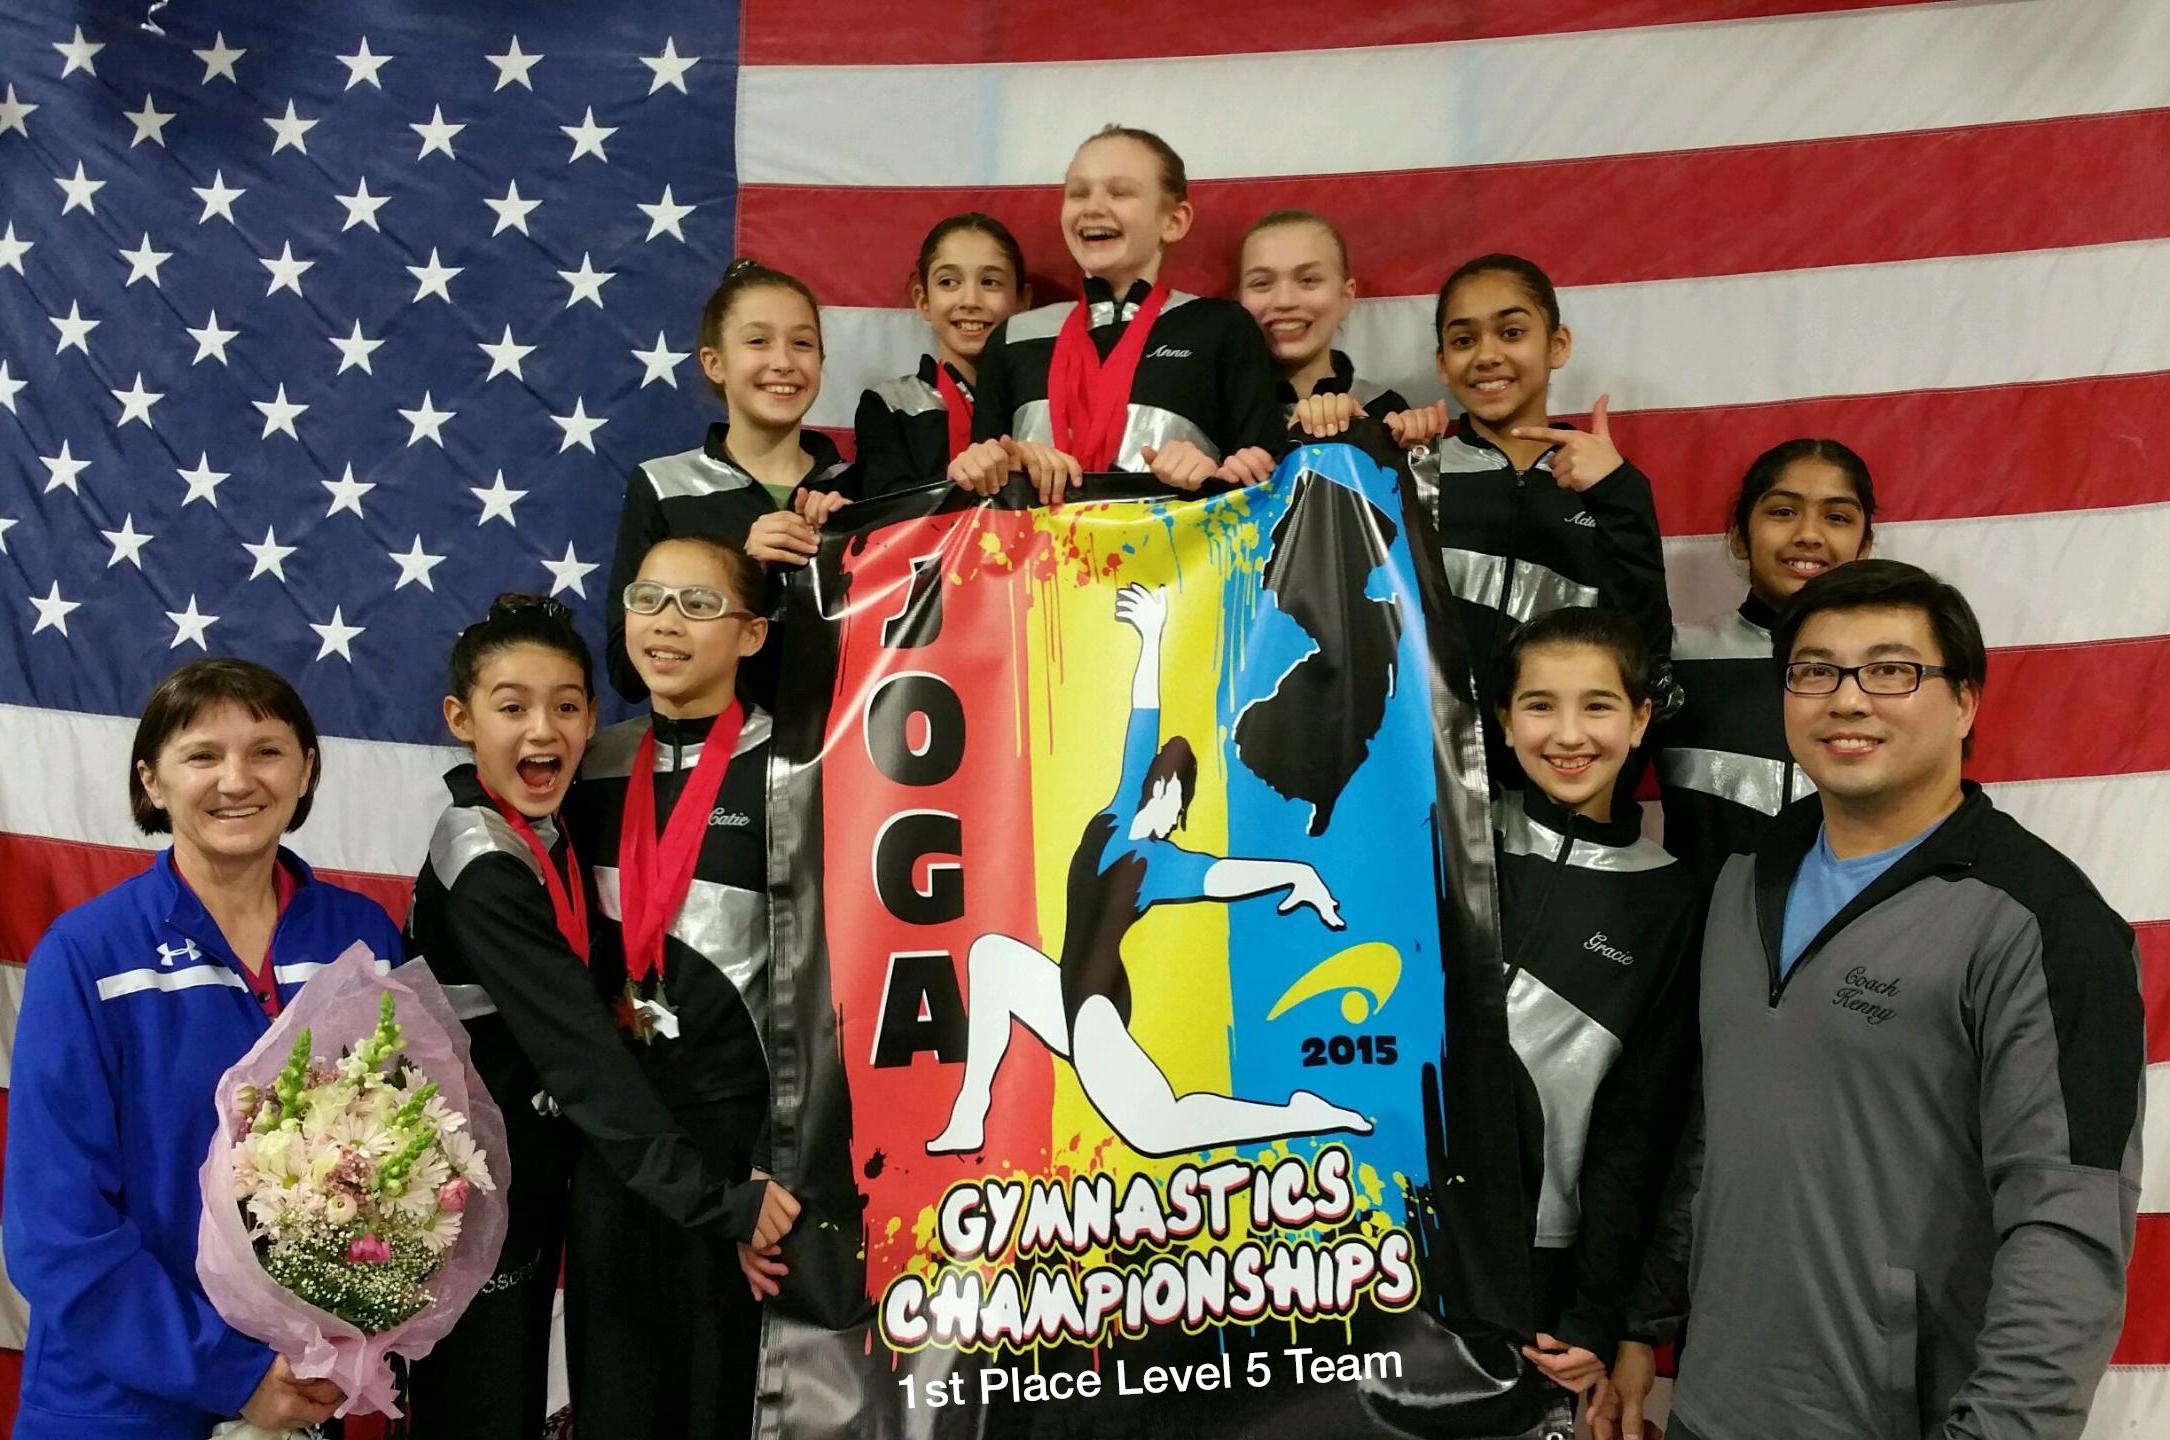 JOGA Level 5 State Champion 2015